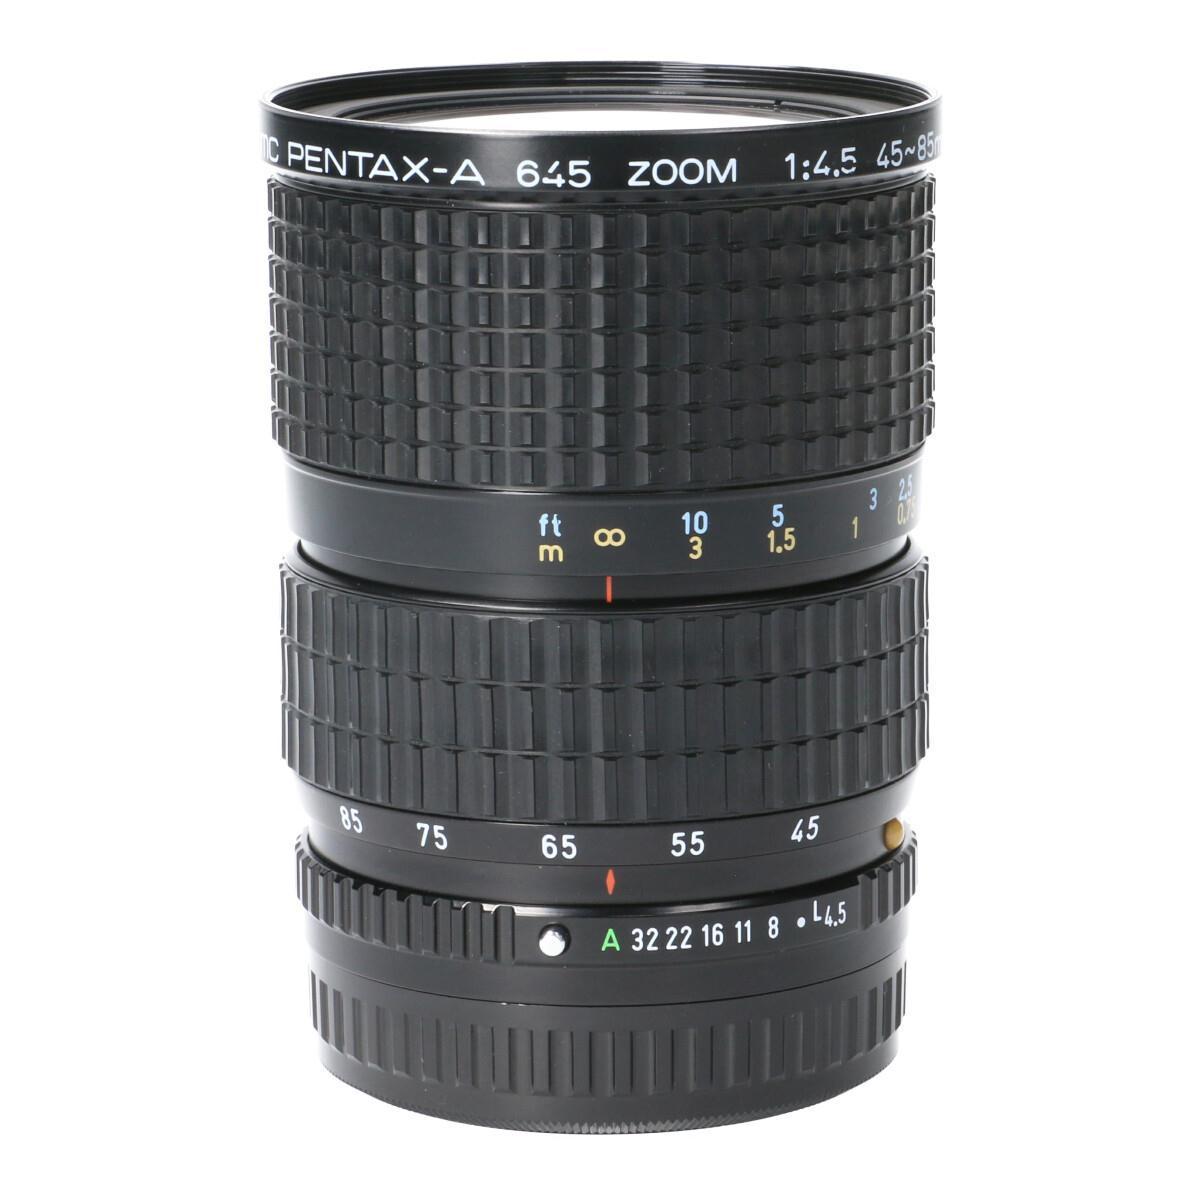 PENTAX A645 45-85mm F4.5【中古】